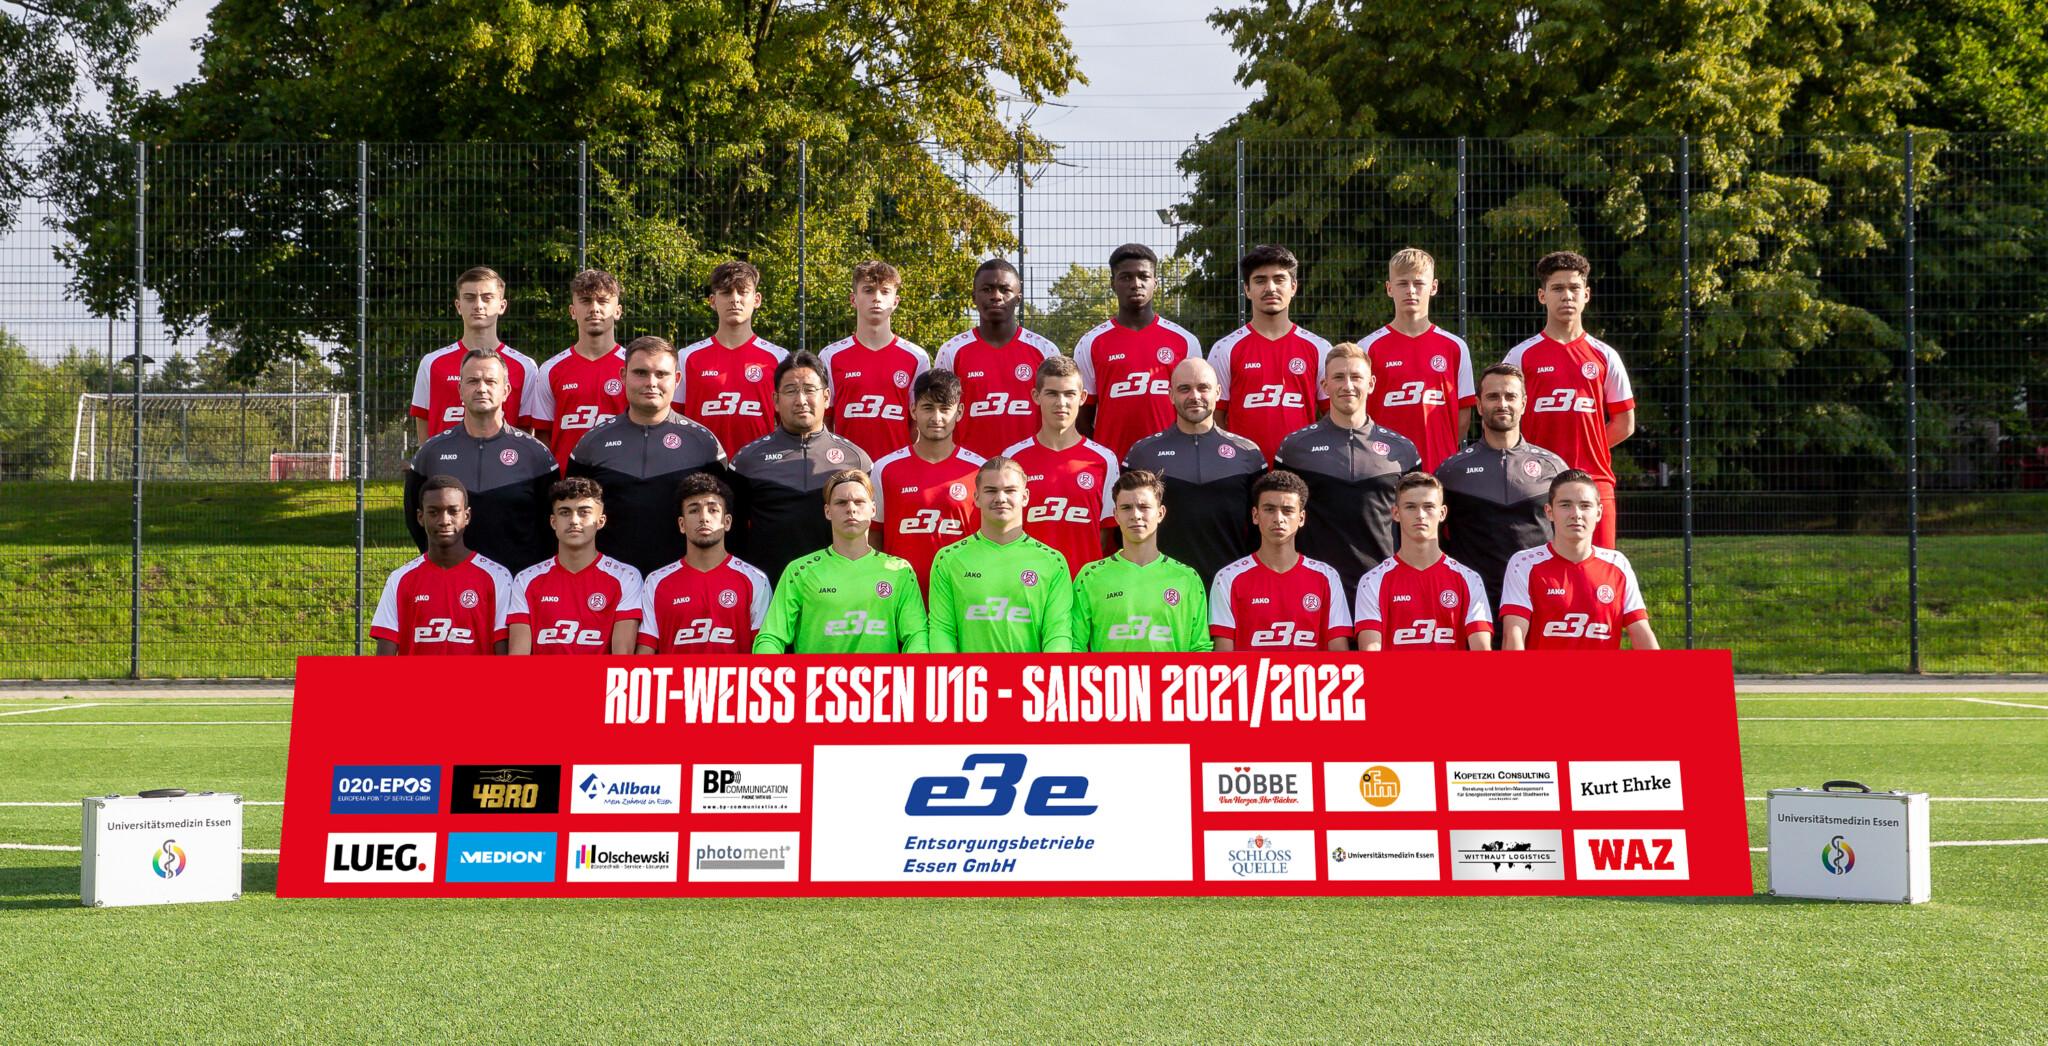 U16 – Rot-Weiss Essen